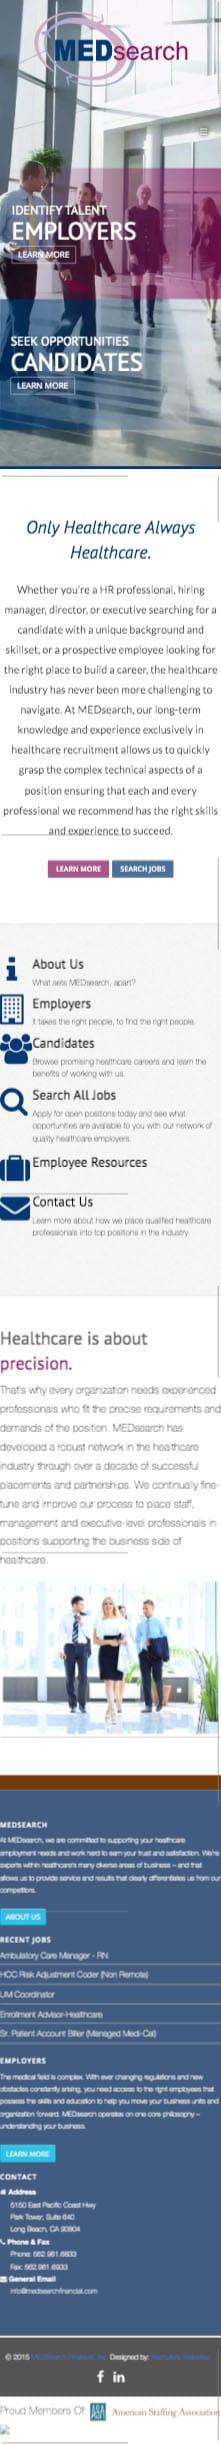 MEDsearch Financial